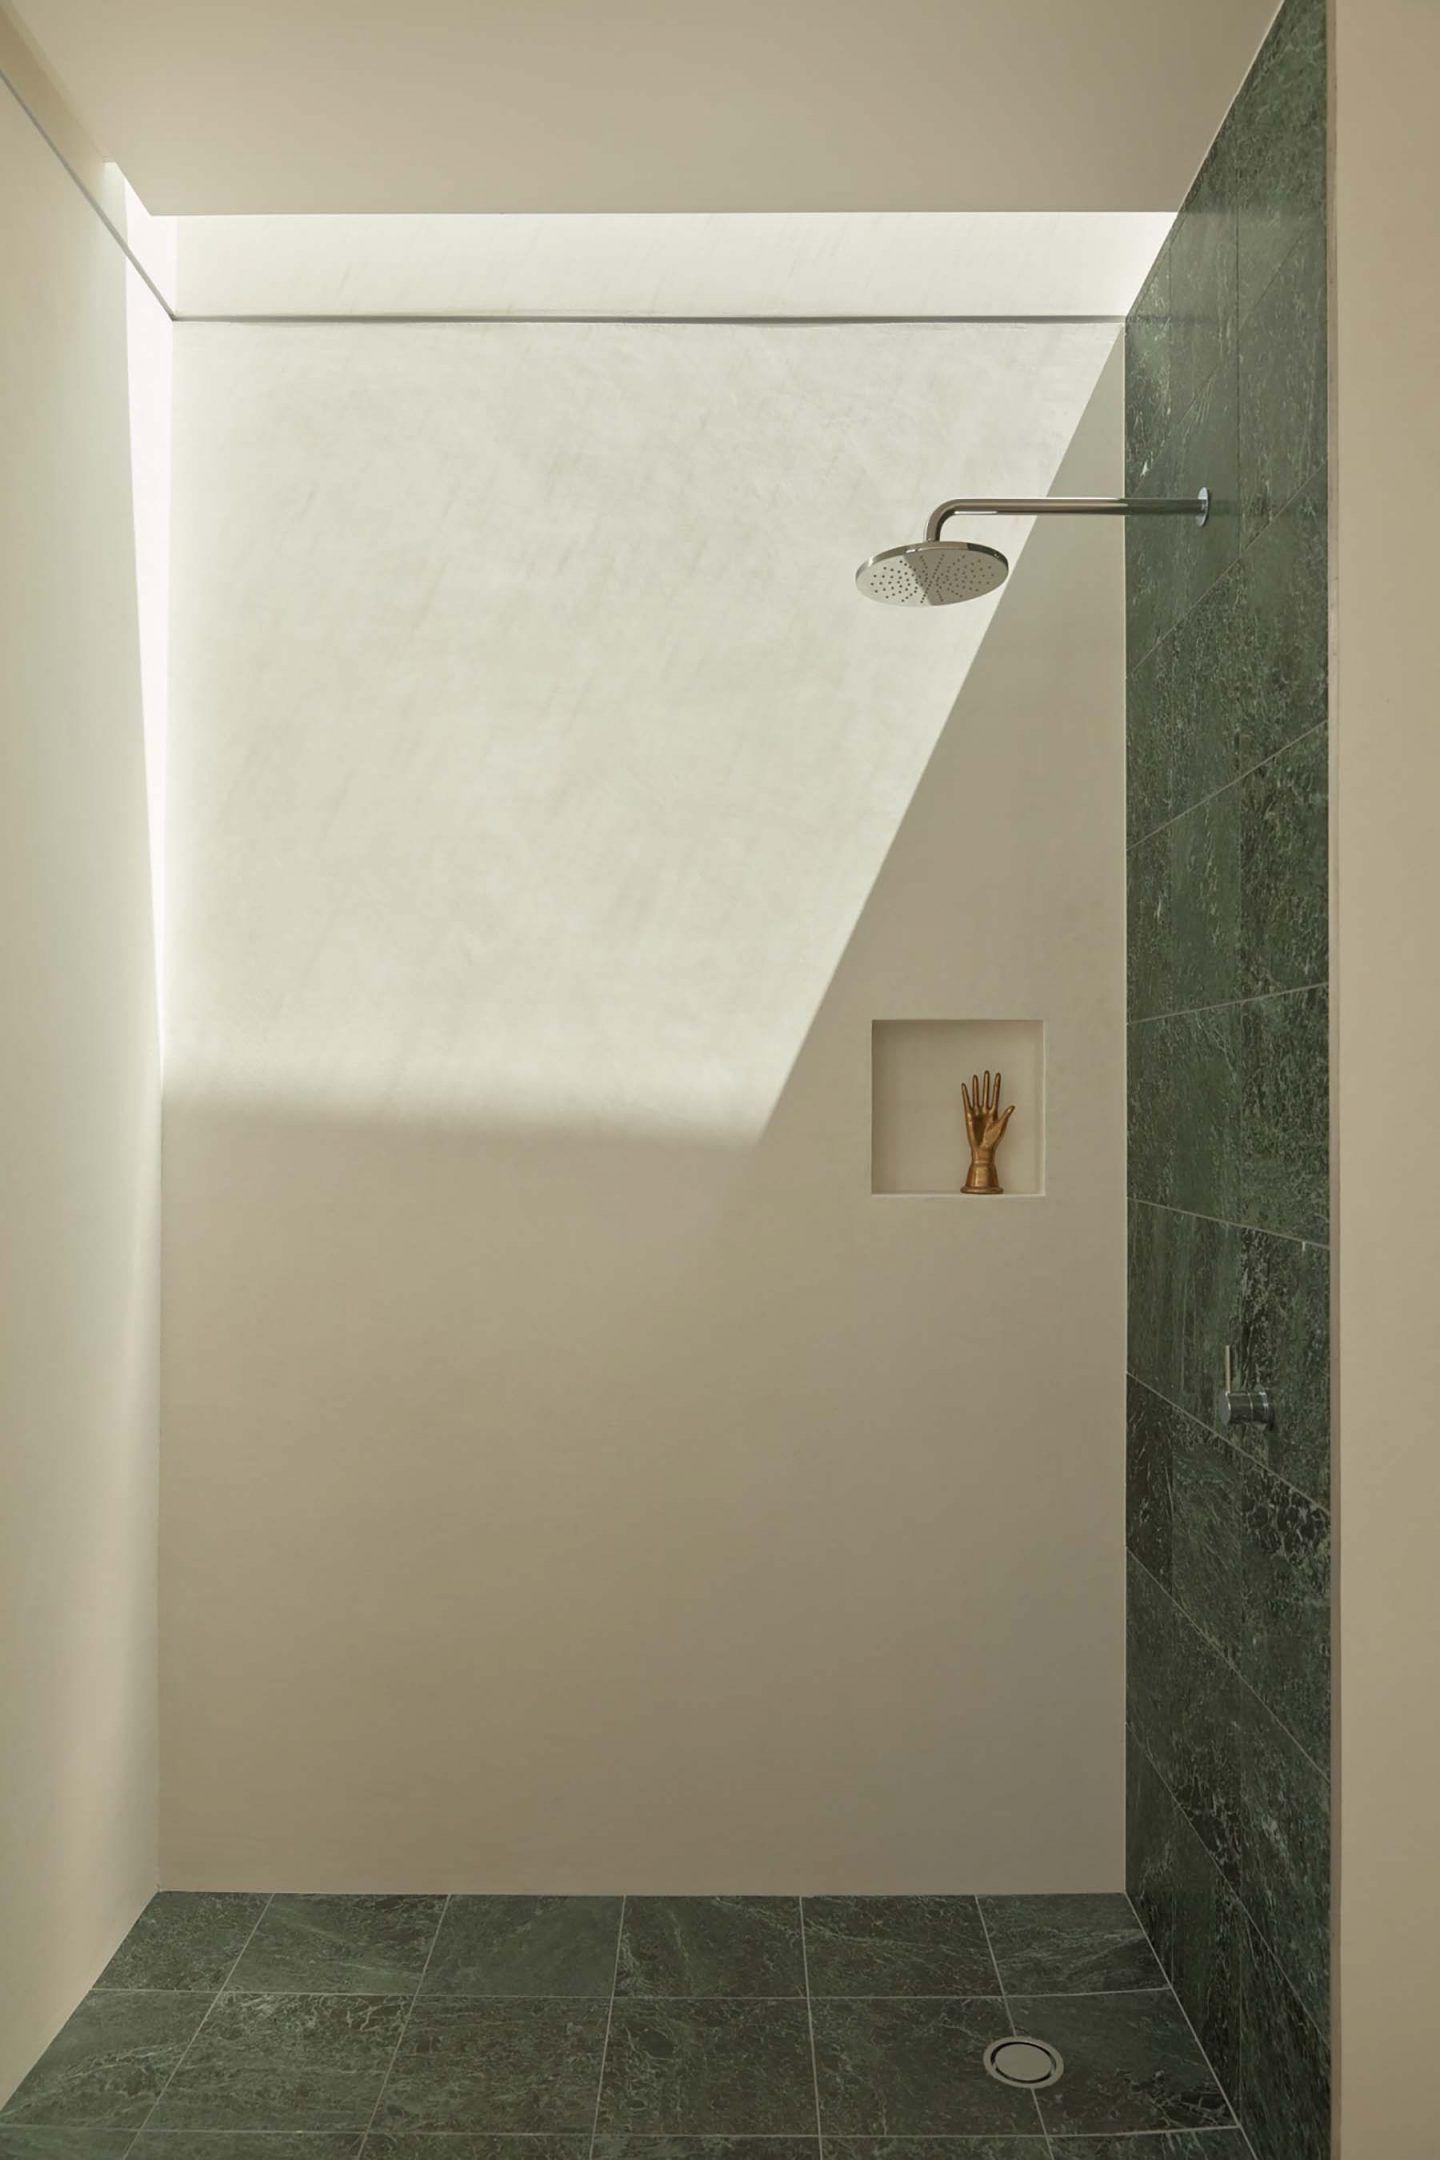 IGNANT-Architecture-Oliver-du-Puy-Architects-Skinny-House-7